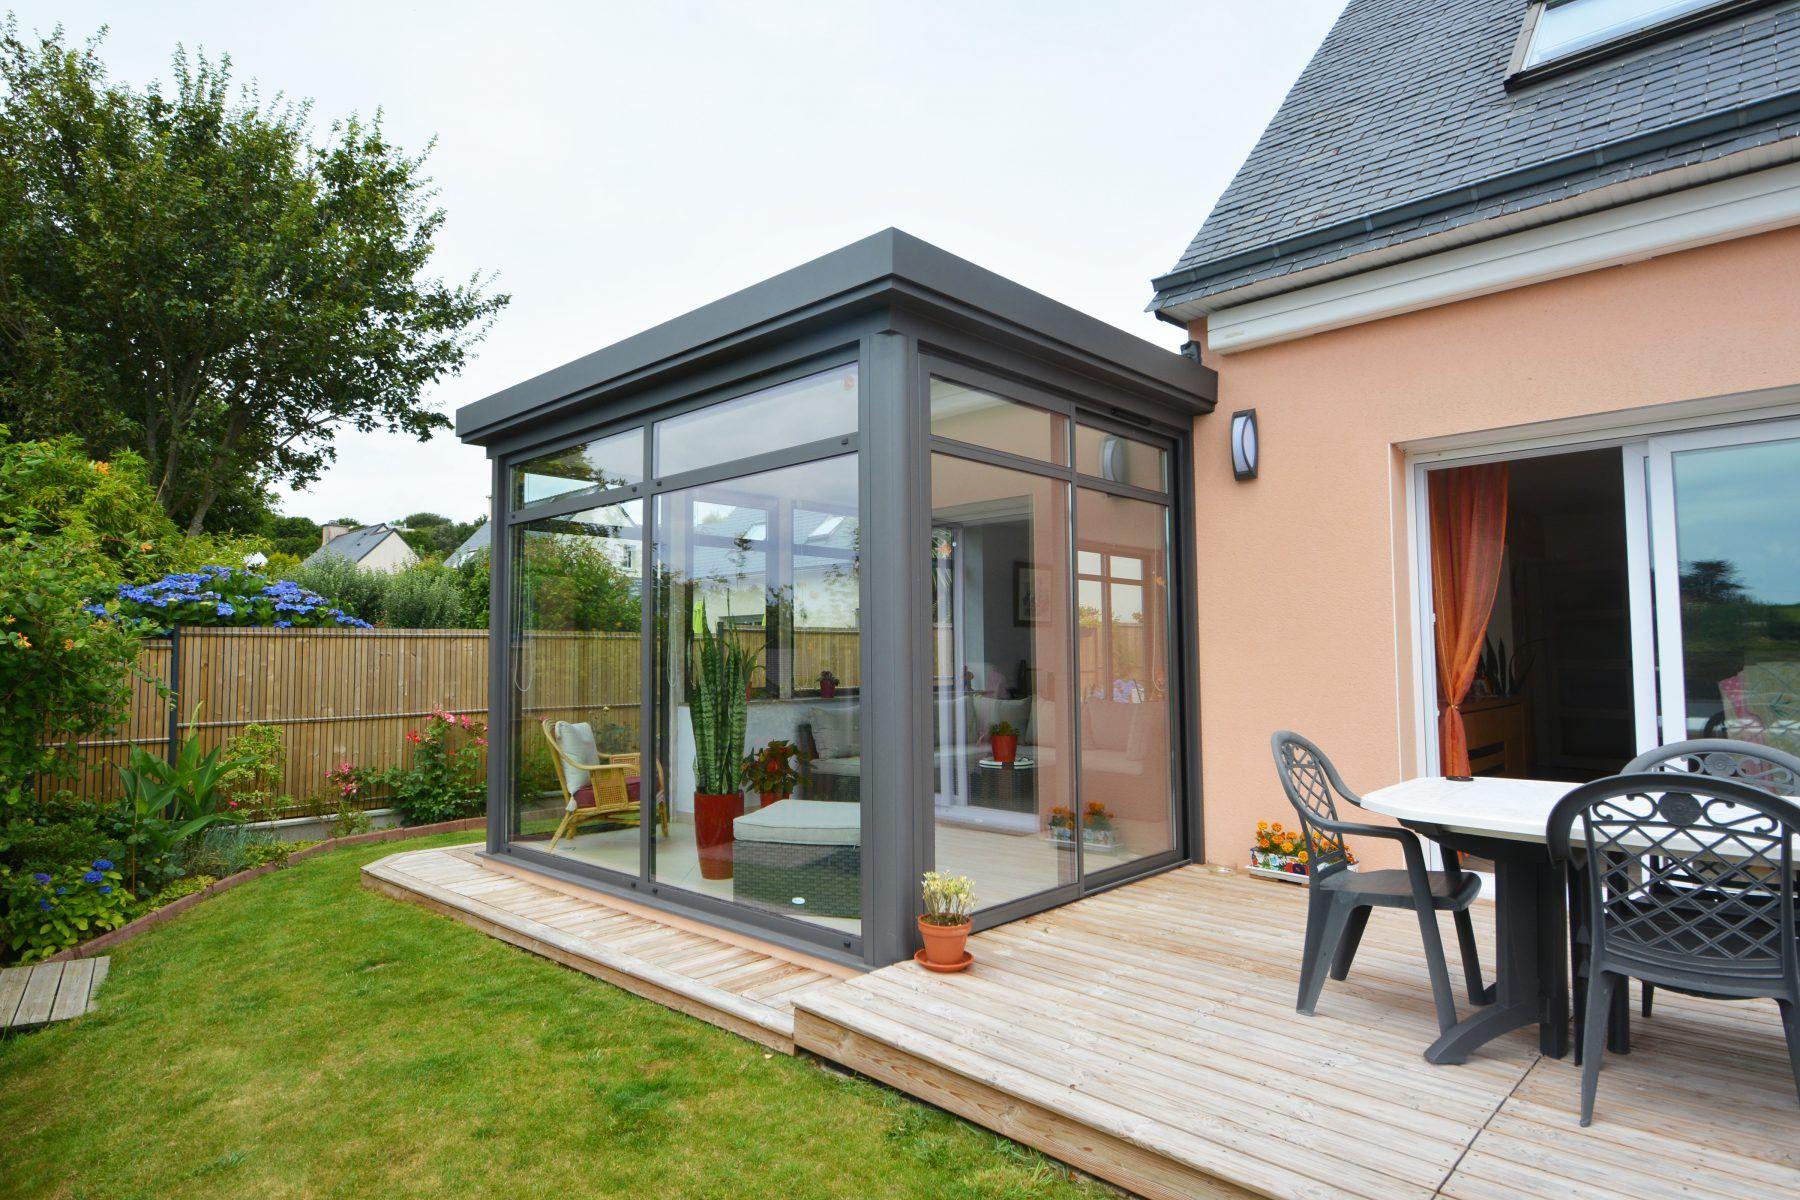 Veranda moderne et classique est idéal pour l'agrandissement maison   Toiture veranda, Veranda ...